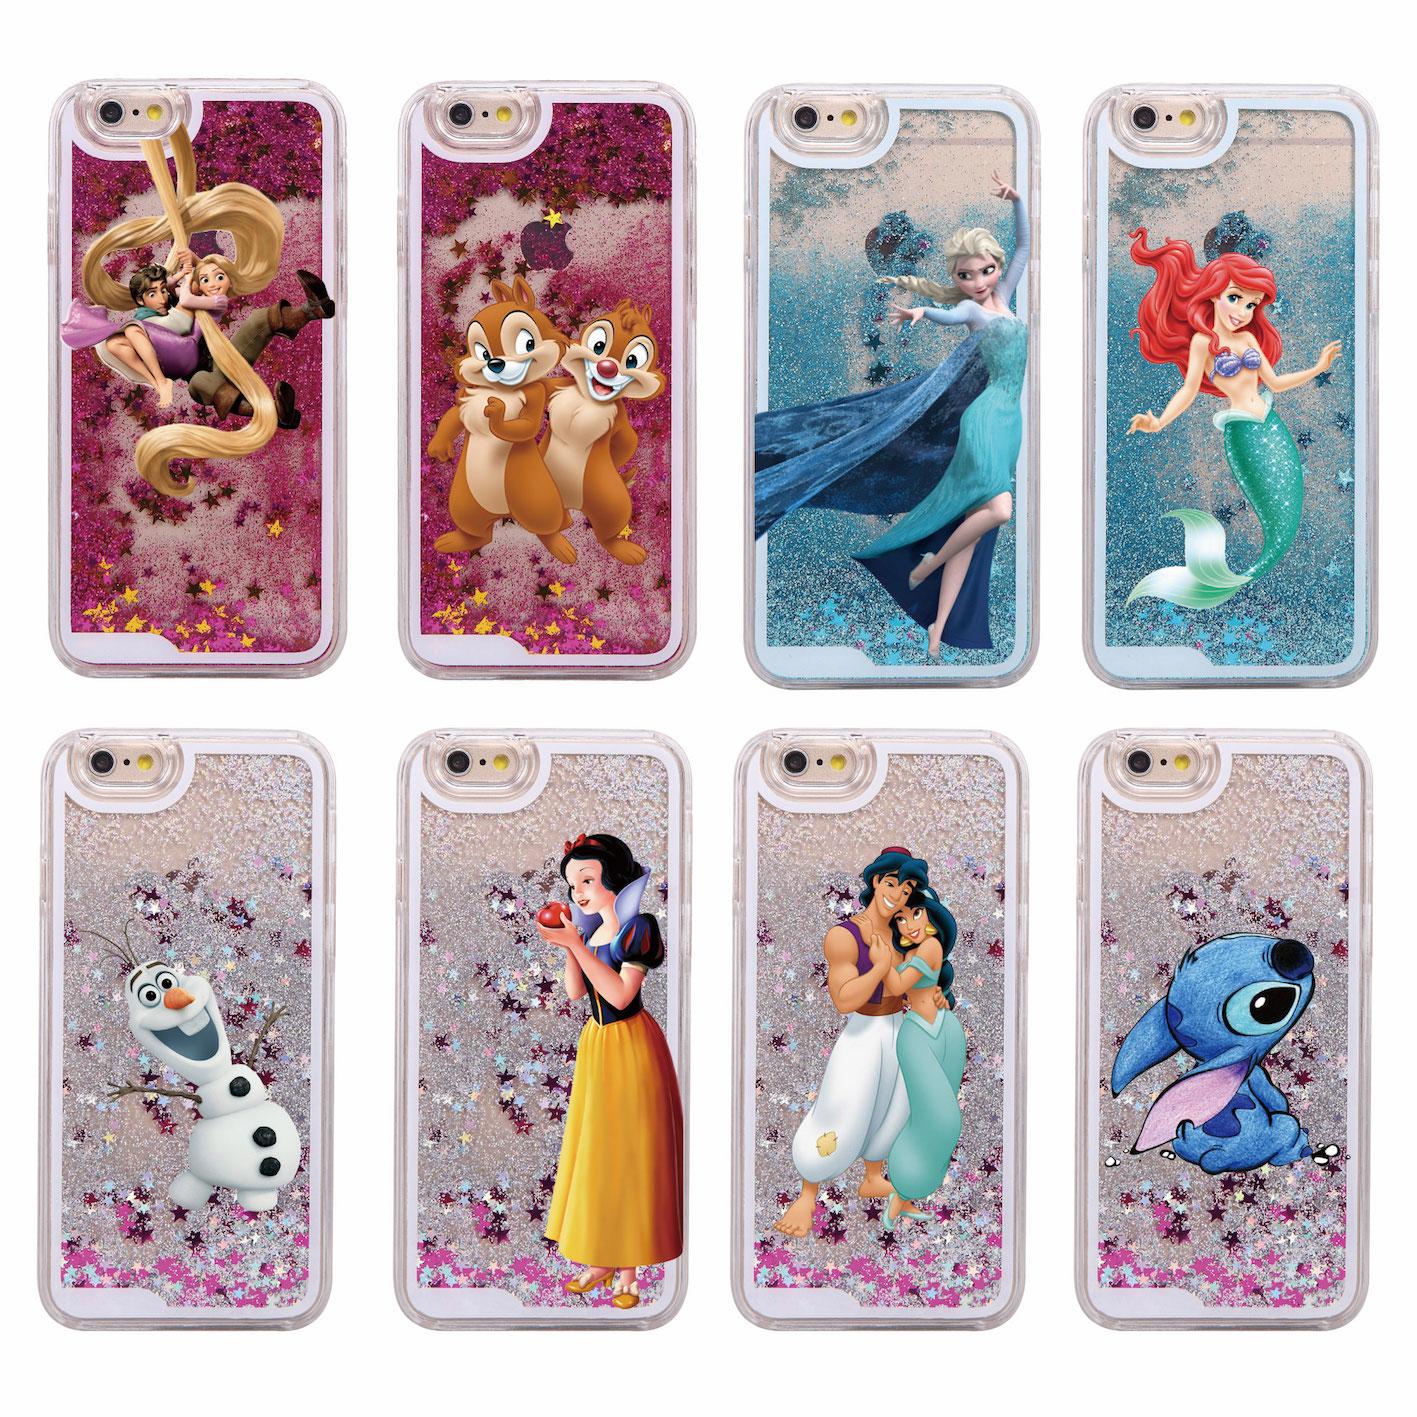 Glitter Liquid Stitch Chip Dale Elsa Mermaid Aladdin Princess Hard Case For iPhone 7 7Plus 6 6S 6Plus 5 5S SE(China (Mainland))